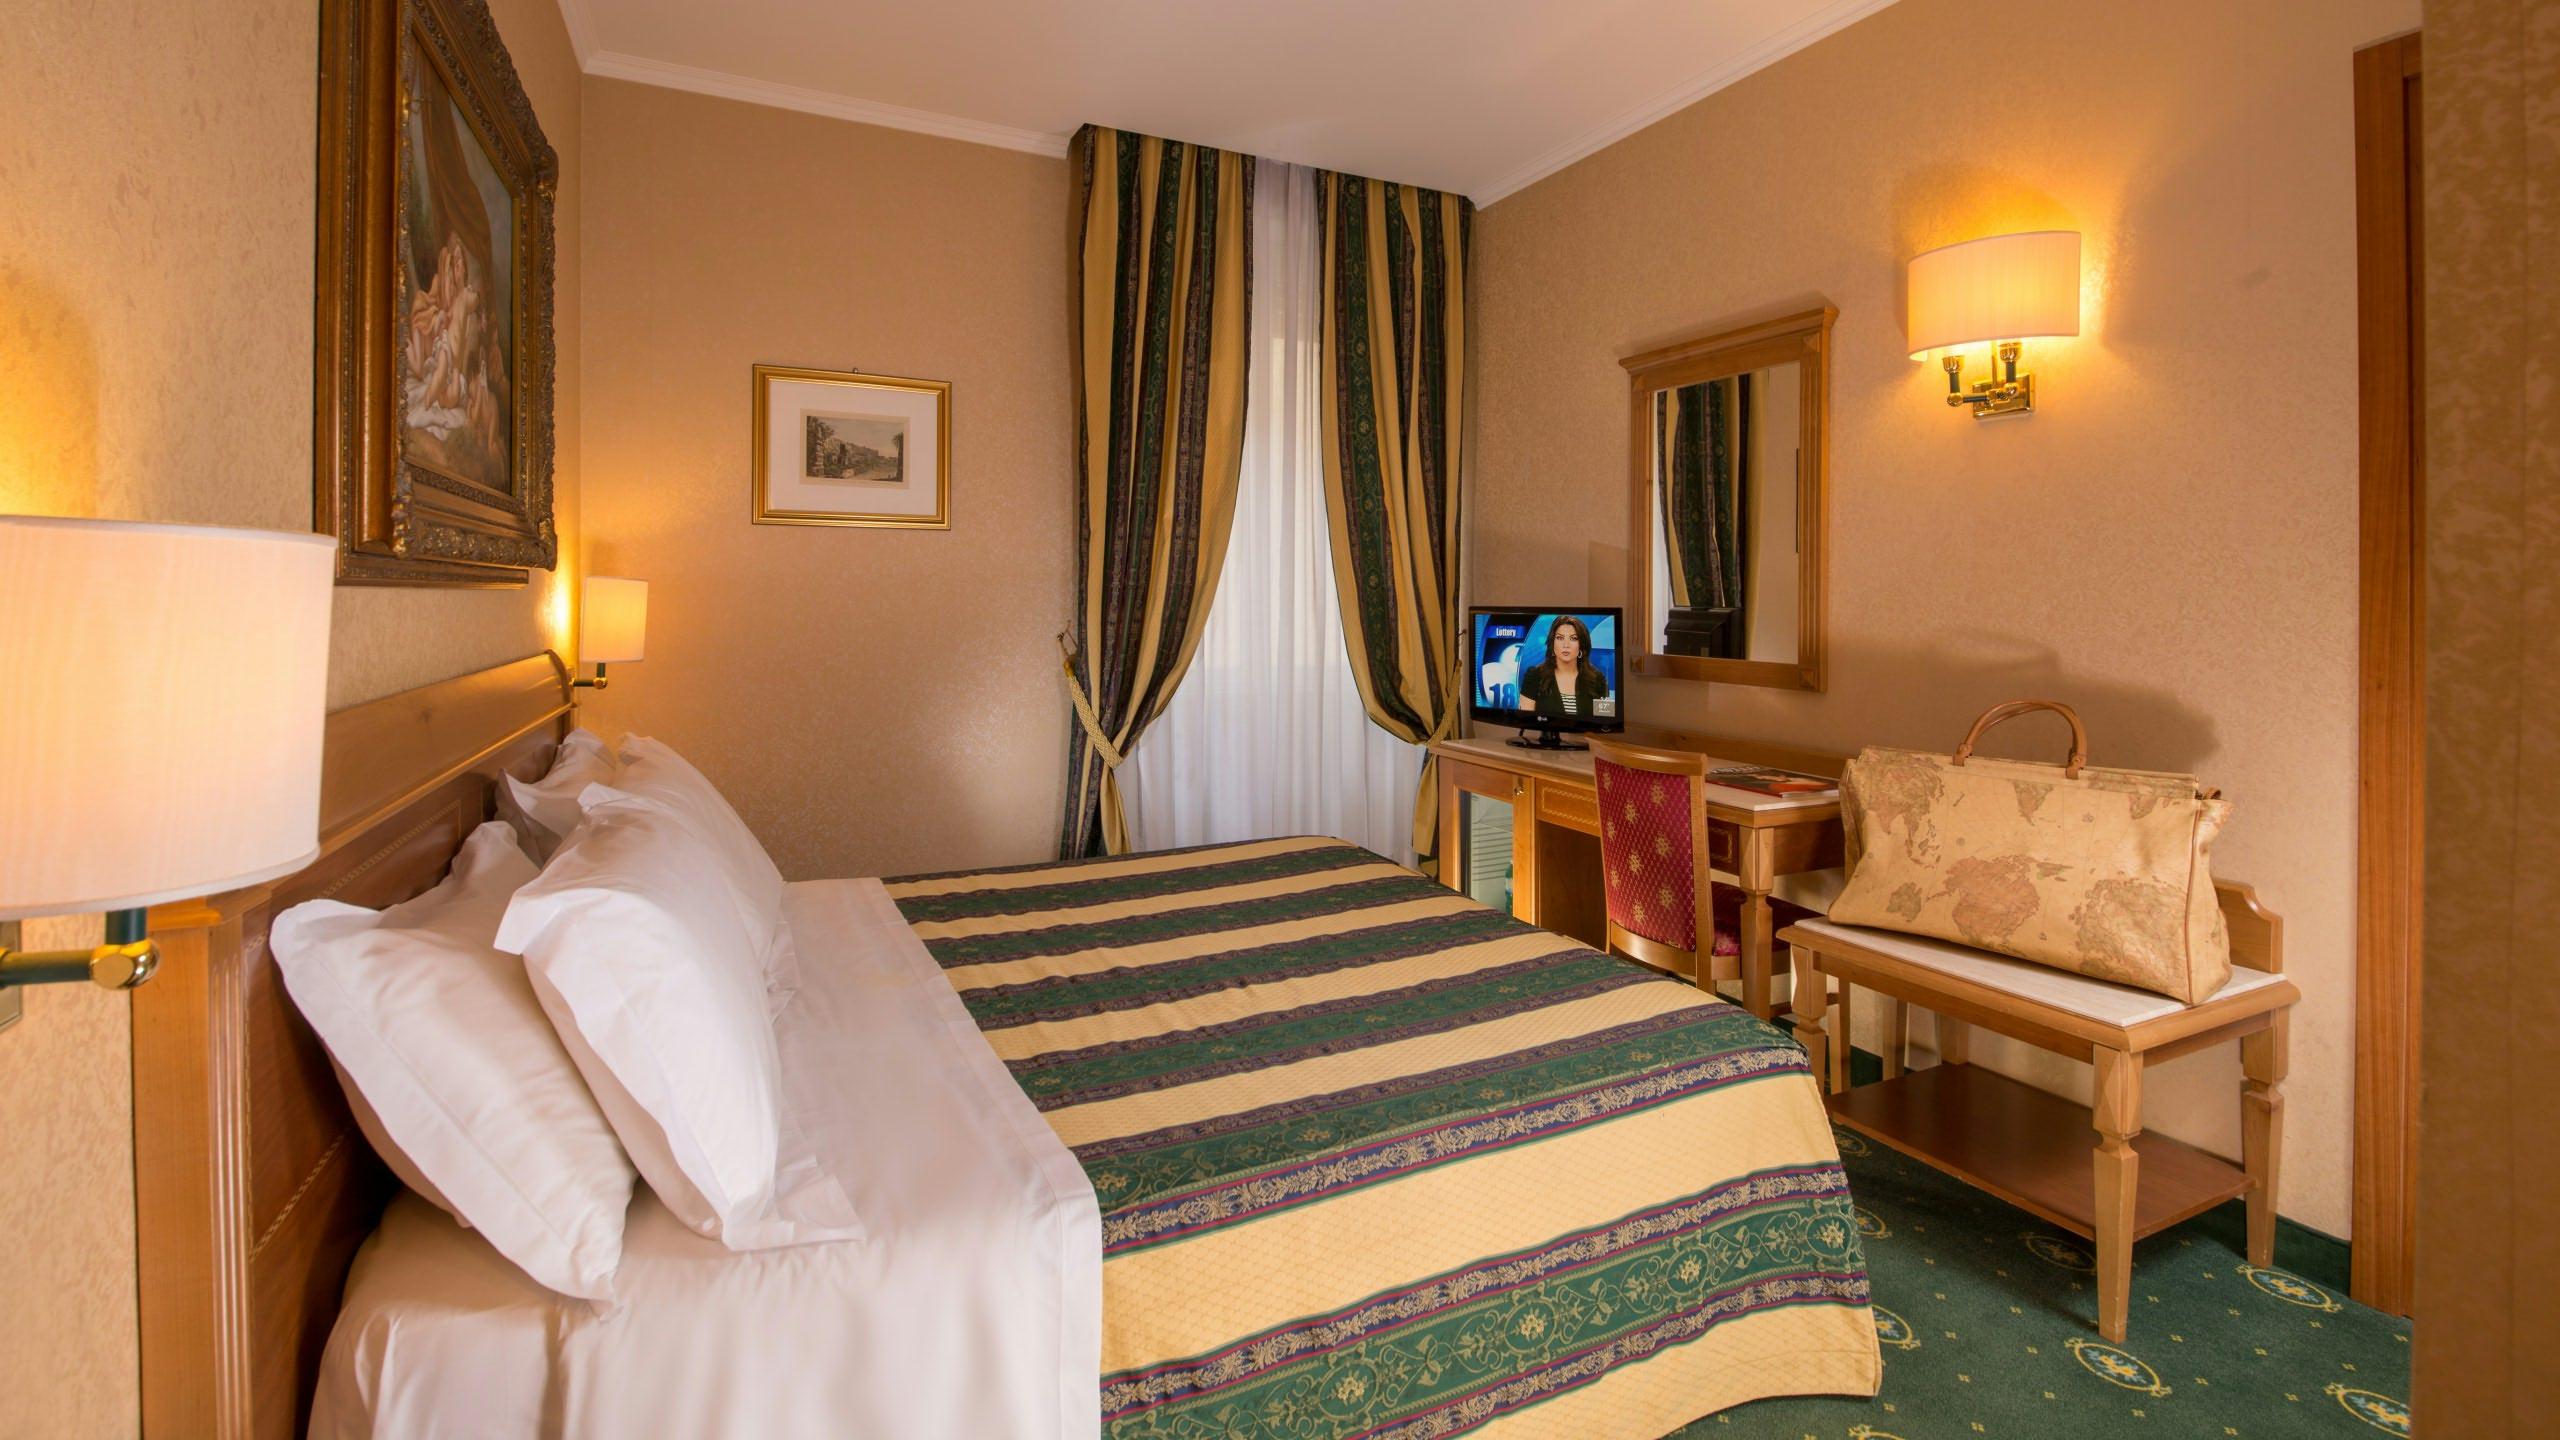 Hotel-Colonna-Frascati-camera-13